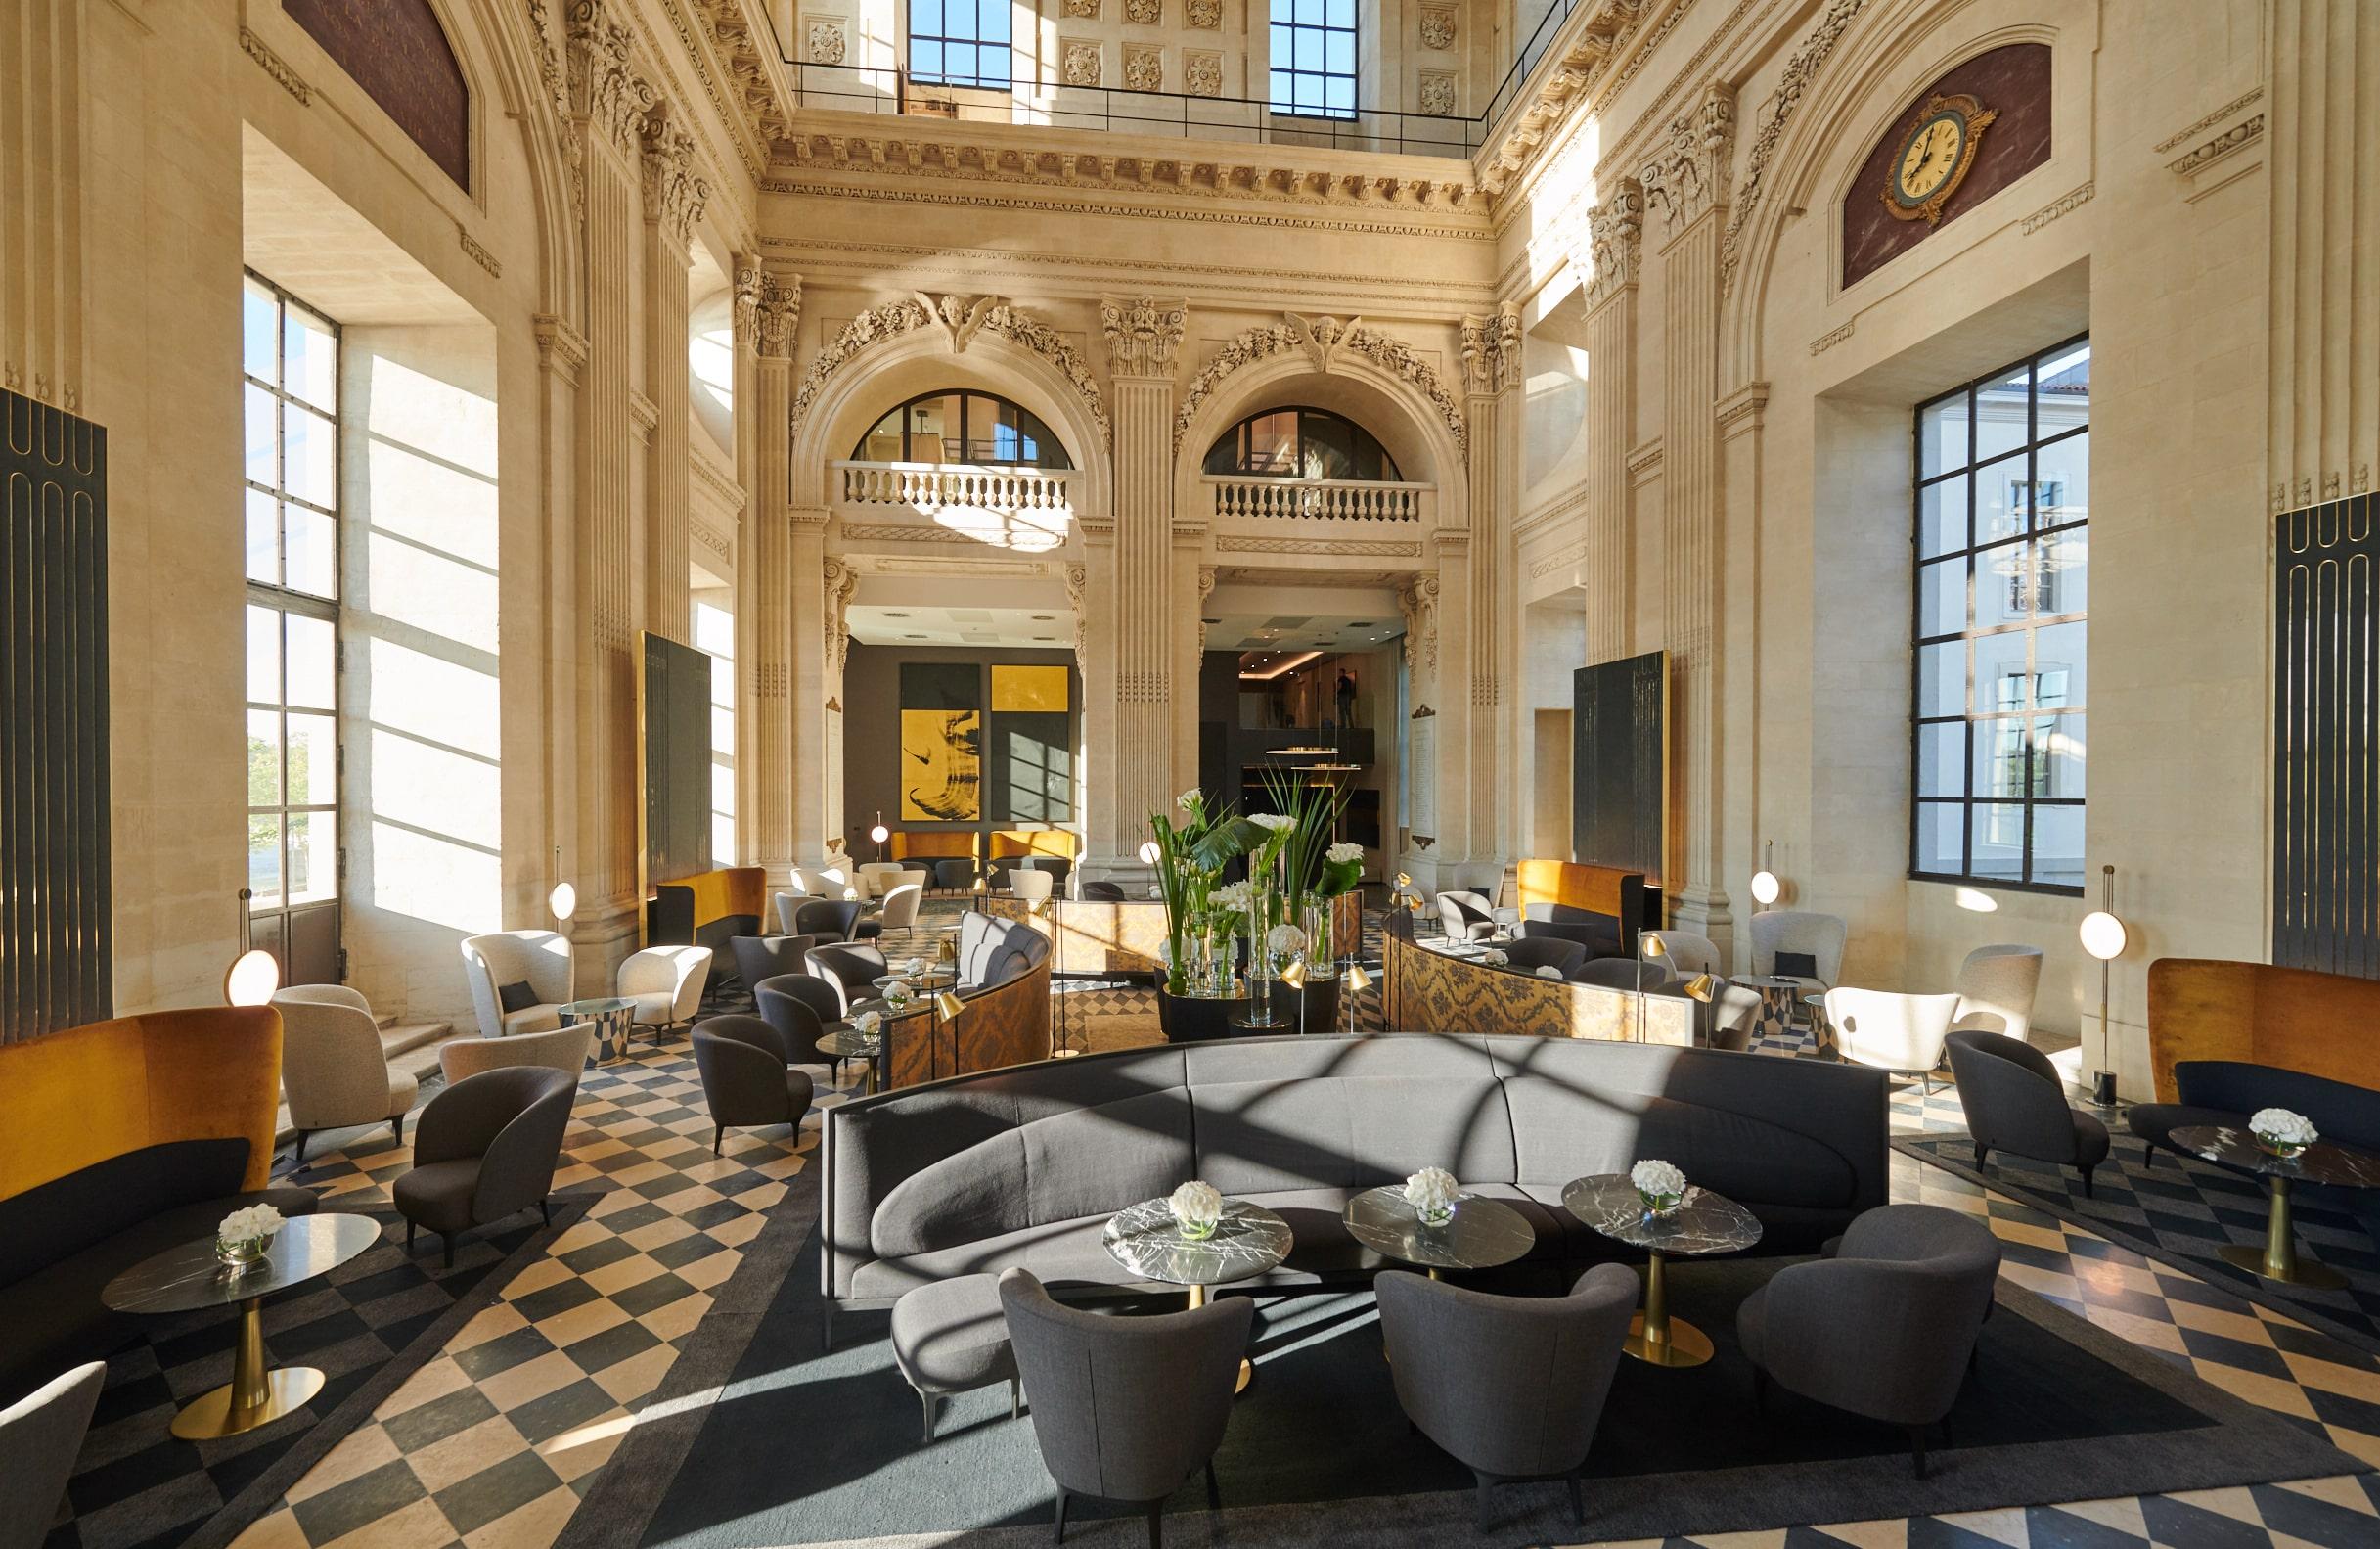 InterContinental Lyon - Hotel Dieu - bar Le Dome - happy hour